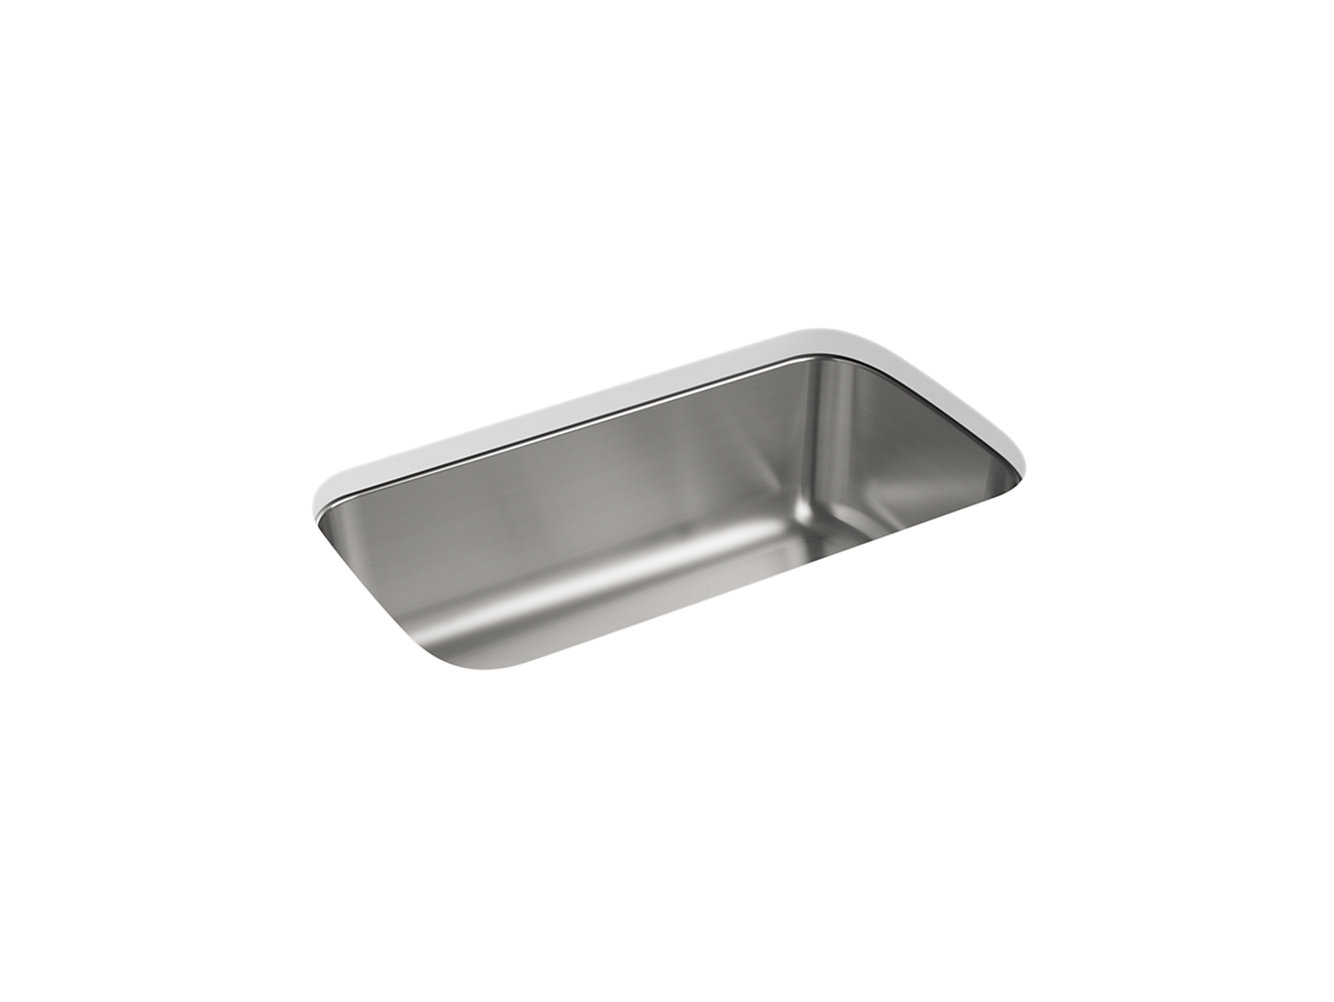 Mcallister 32 X 18 9 Undercounter Single Basin Kitchen Sink 11600 Na Sterling